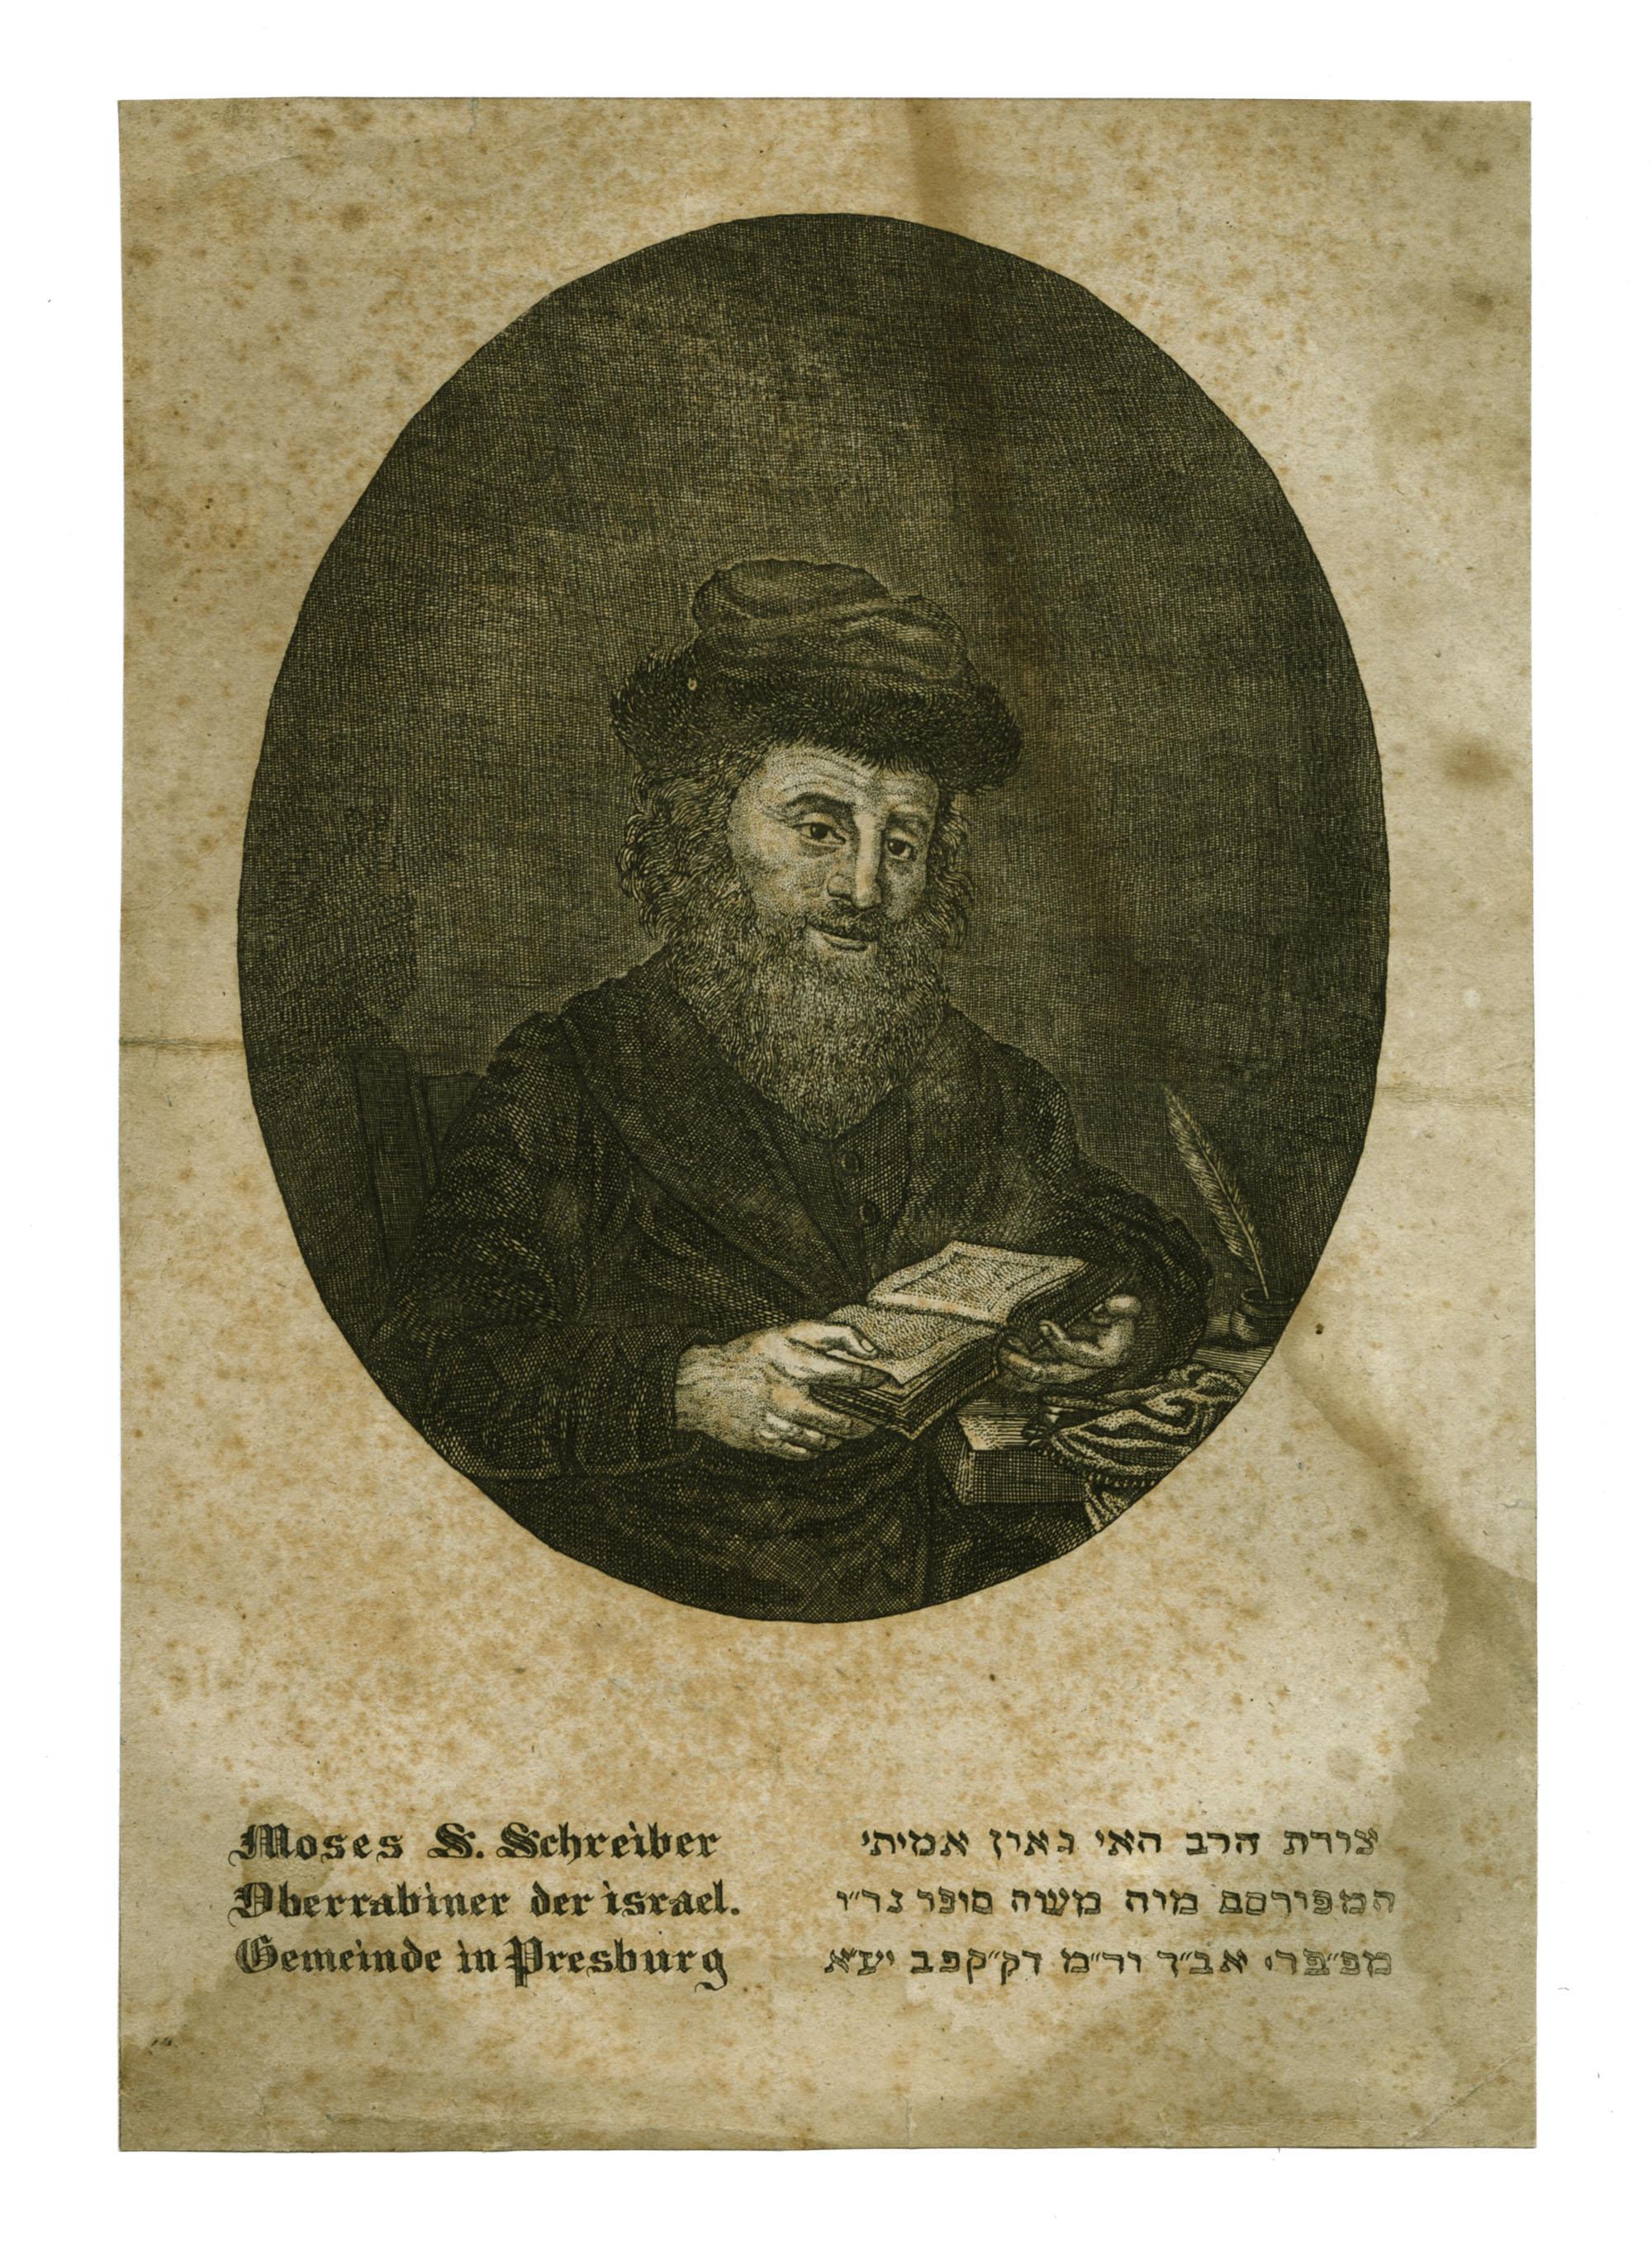 Moses S. Schreiber, Oberrabiner der israel. Gemeinde in Presburg